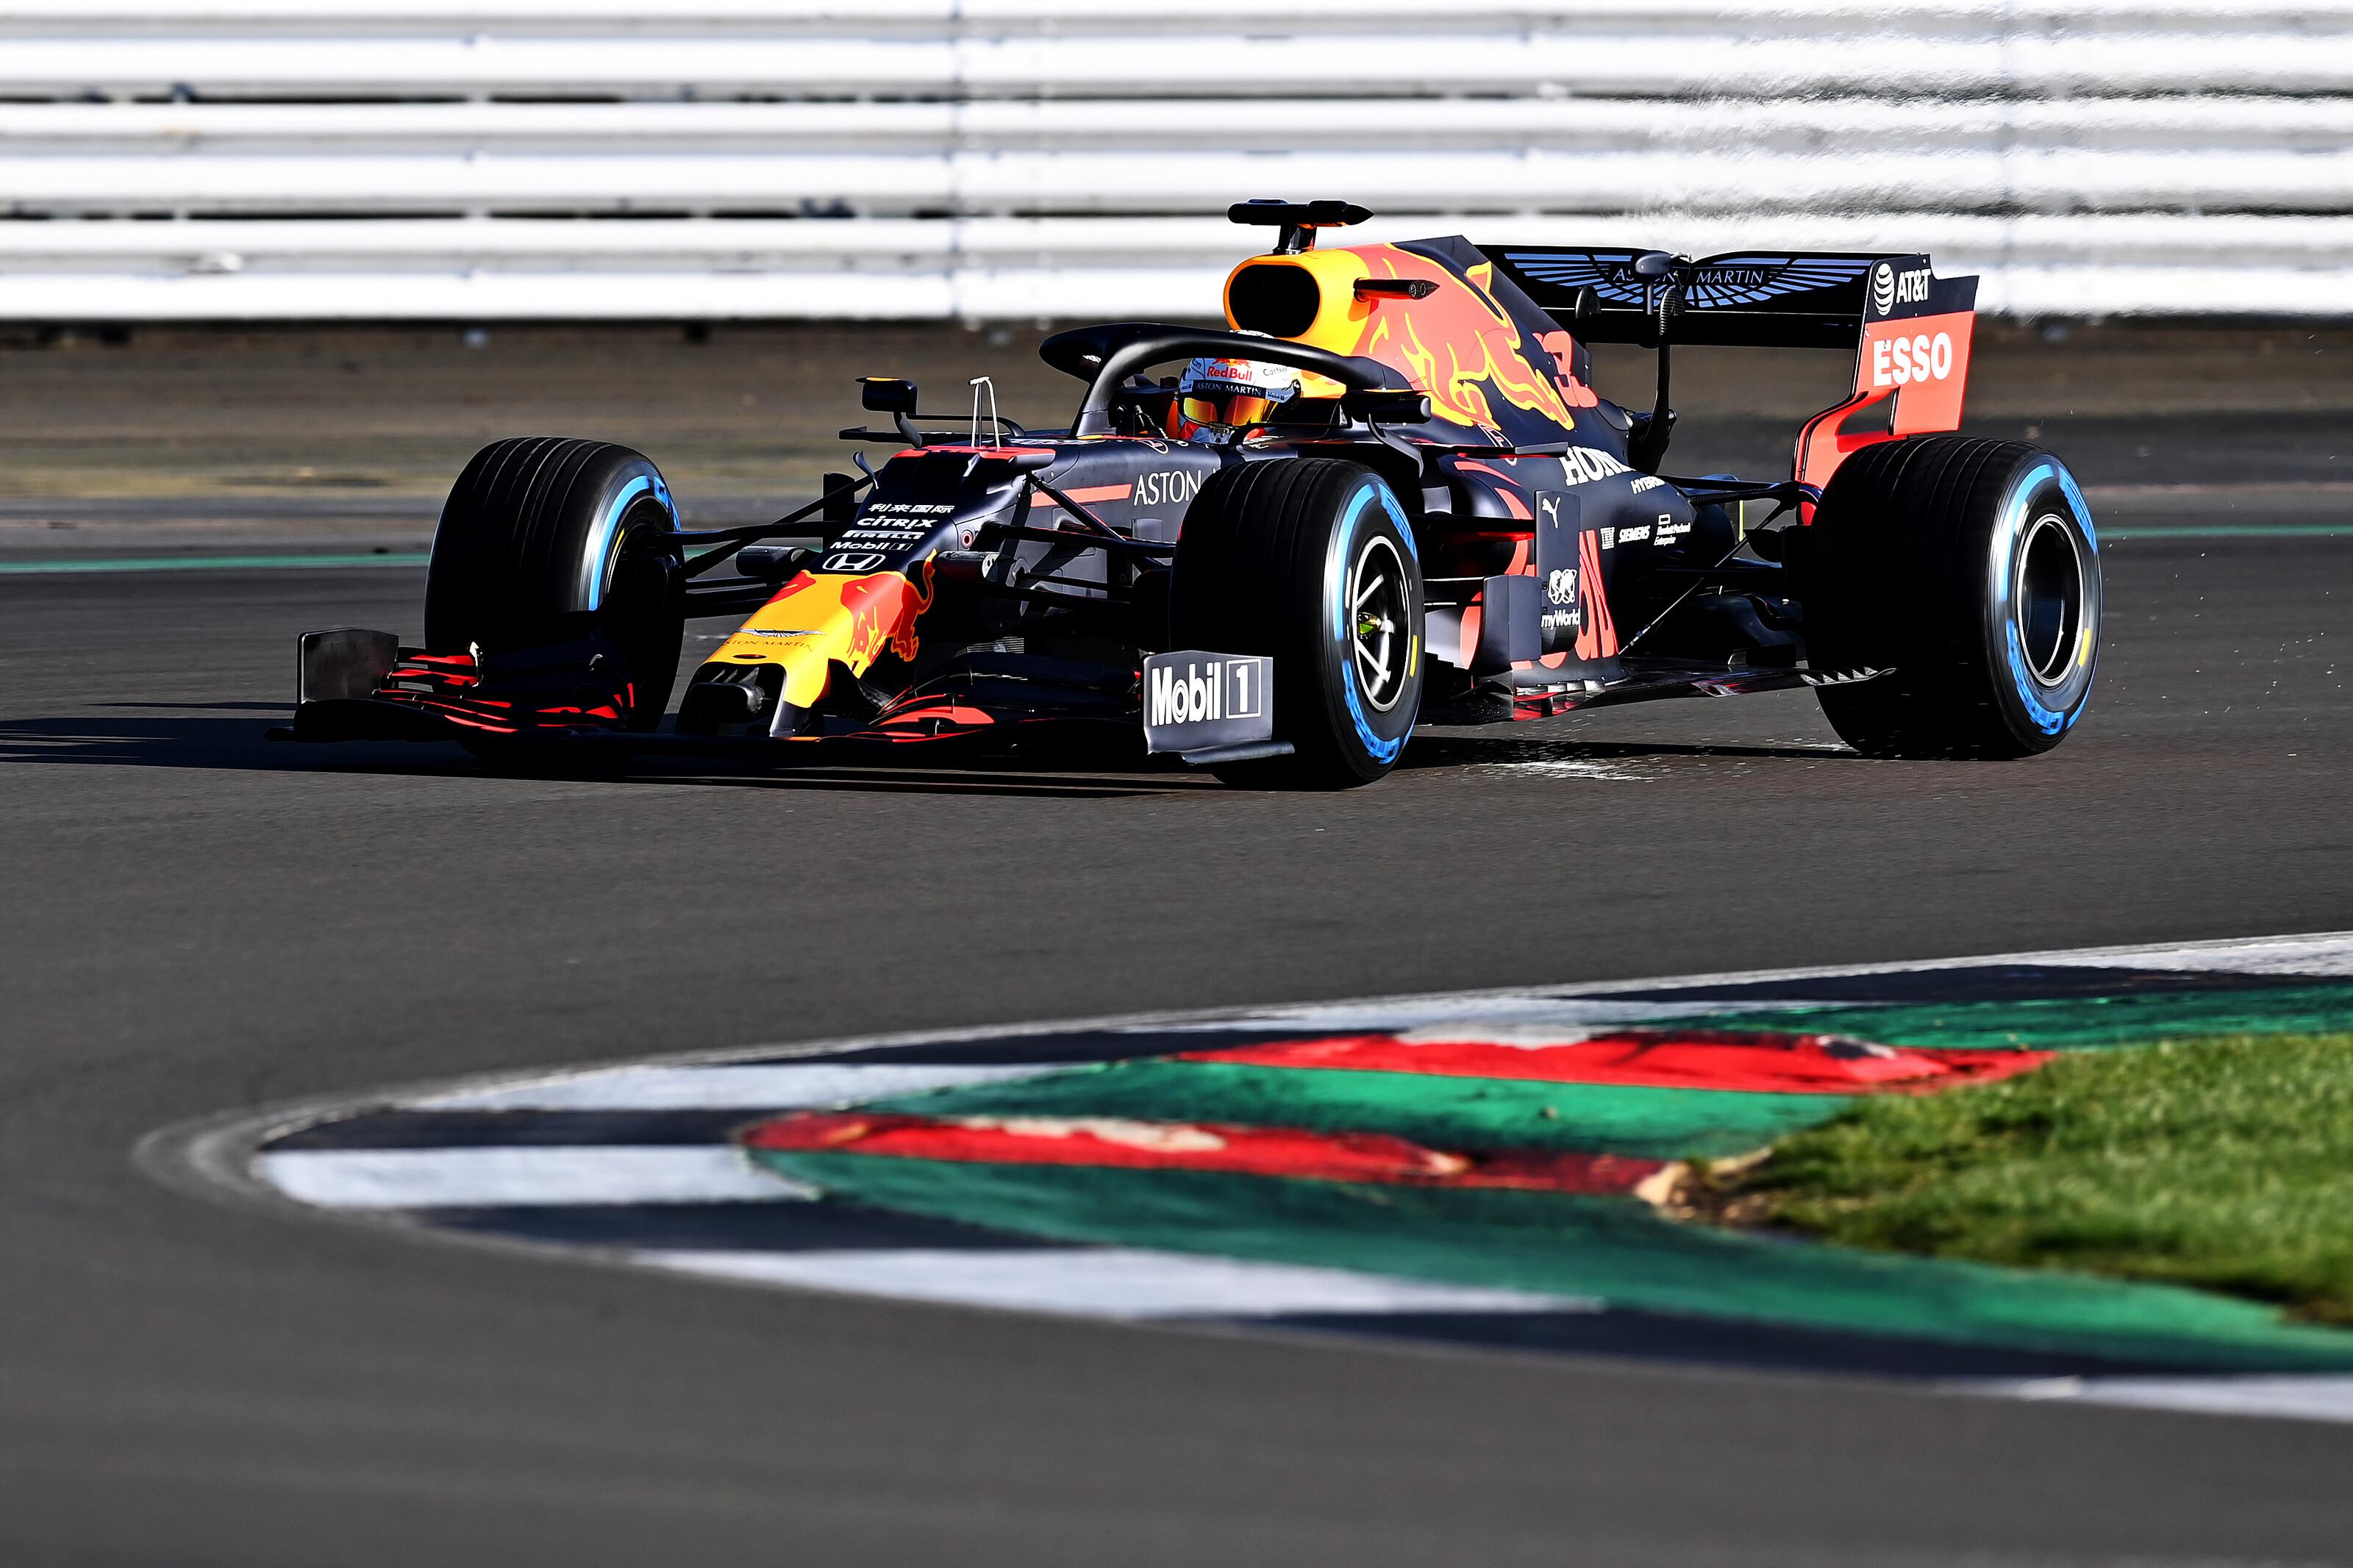 F1 Formula 1 Red Bull 2020 car launch